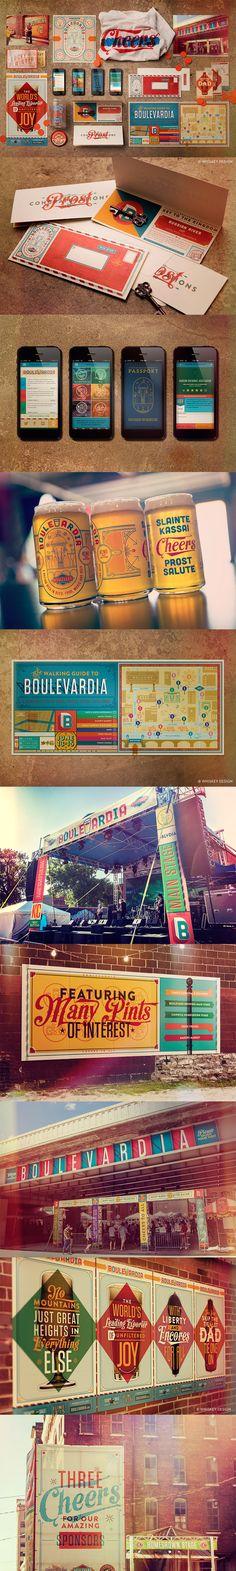 BOULEVARDIA: Event Branding